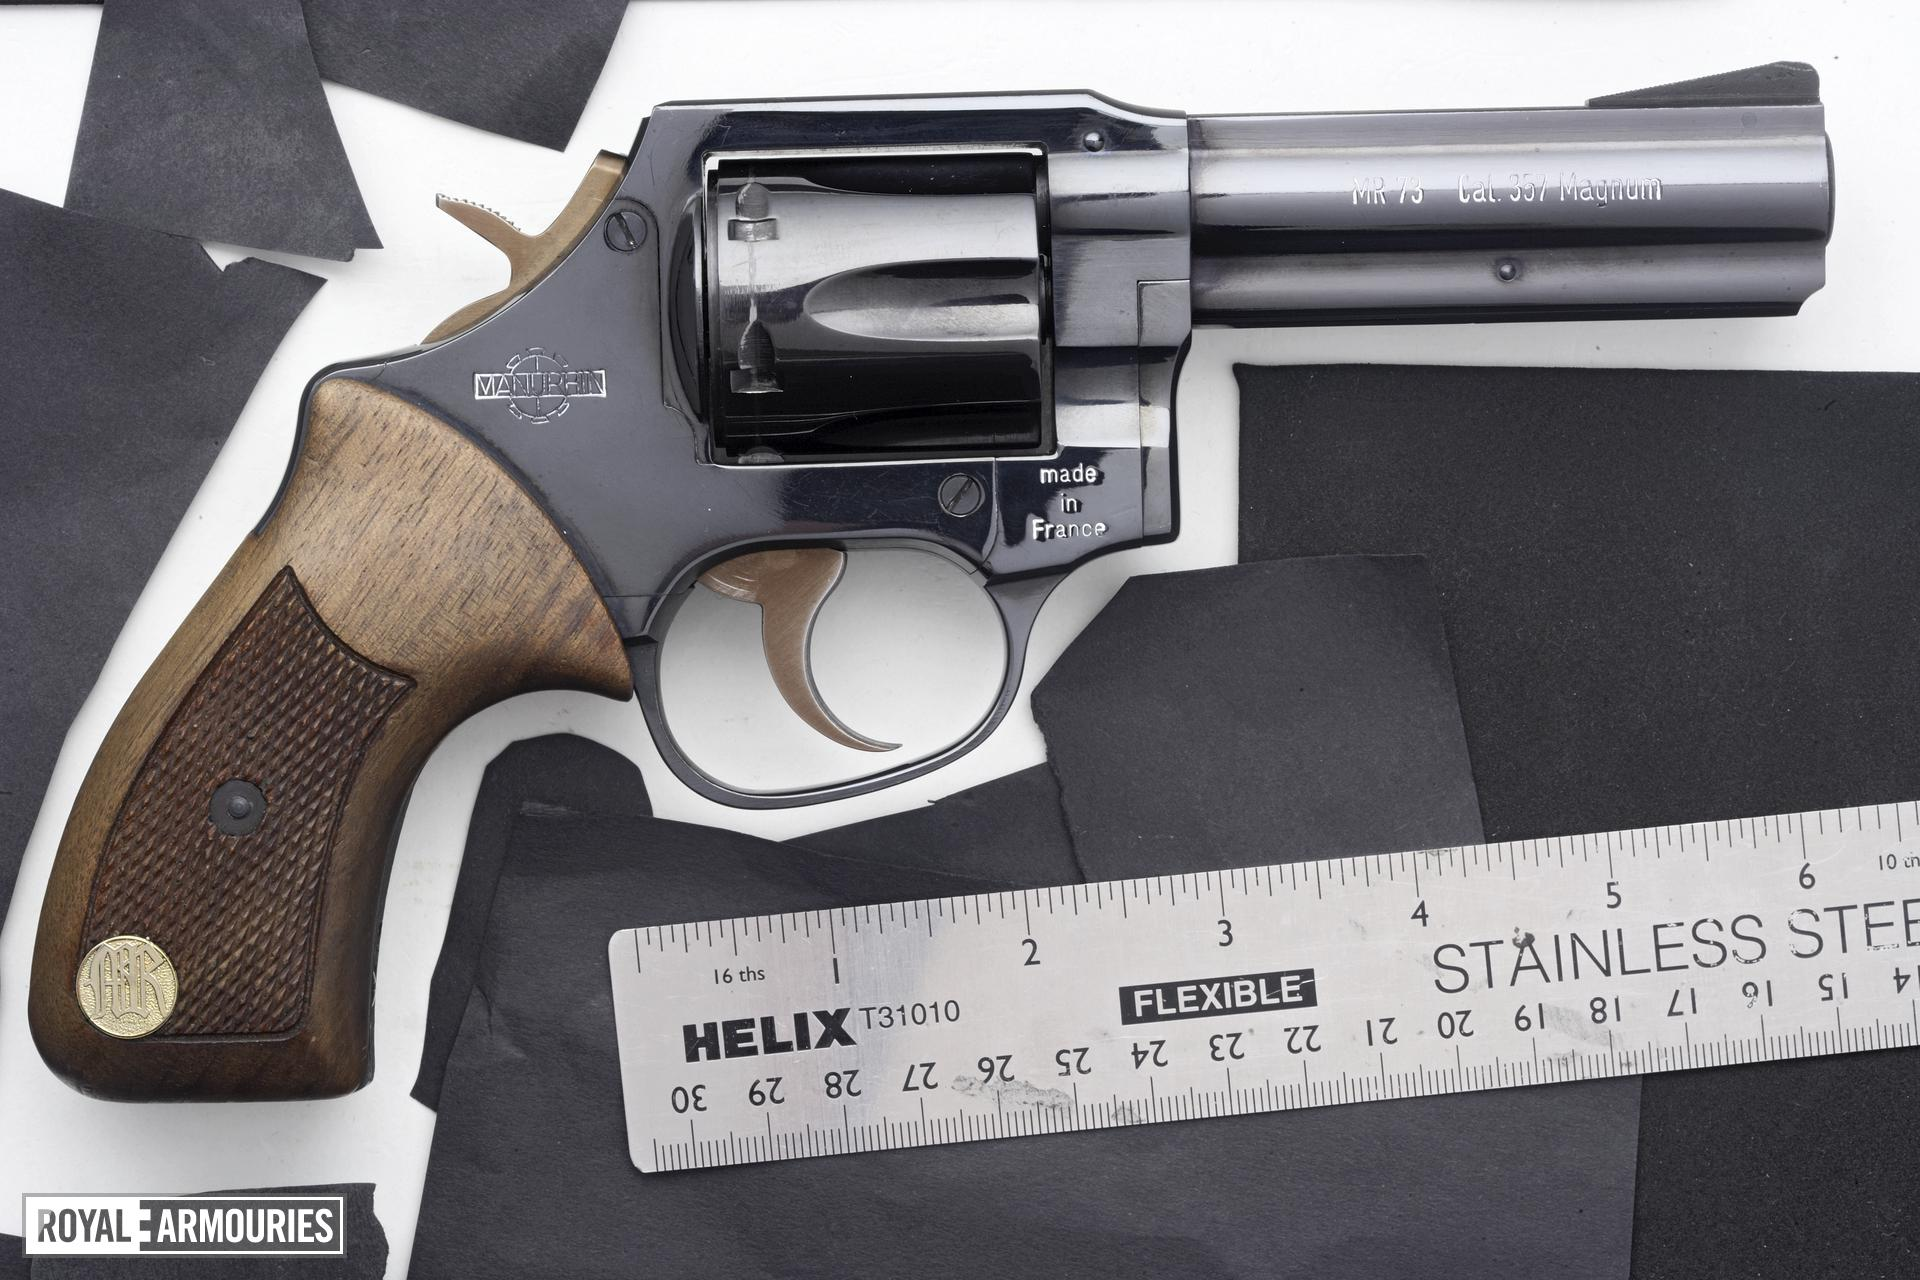 Centrefire six-shot revolver - Manurhin MR73